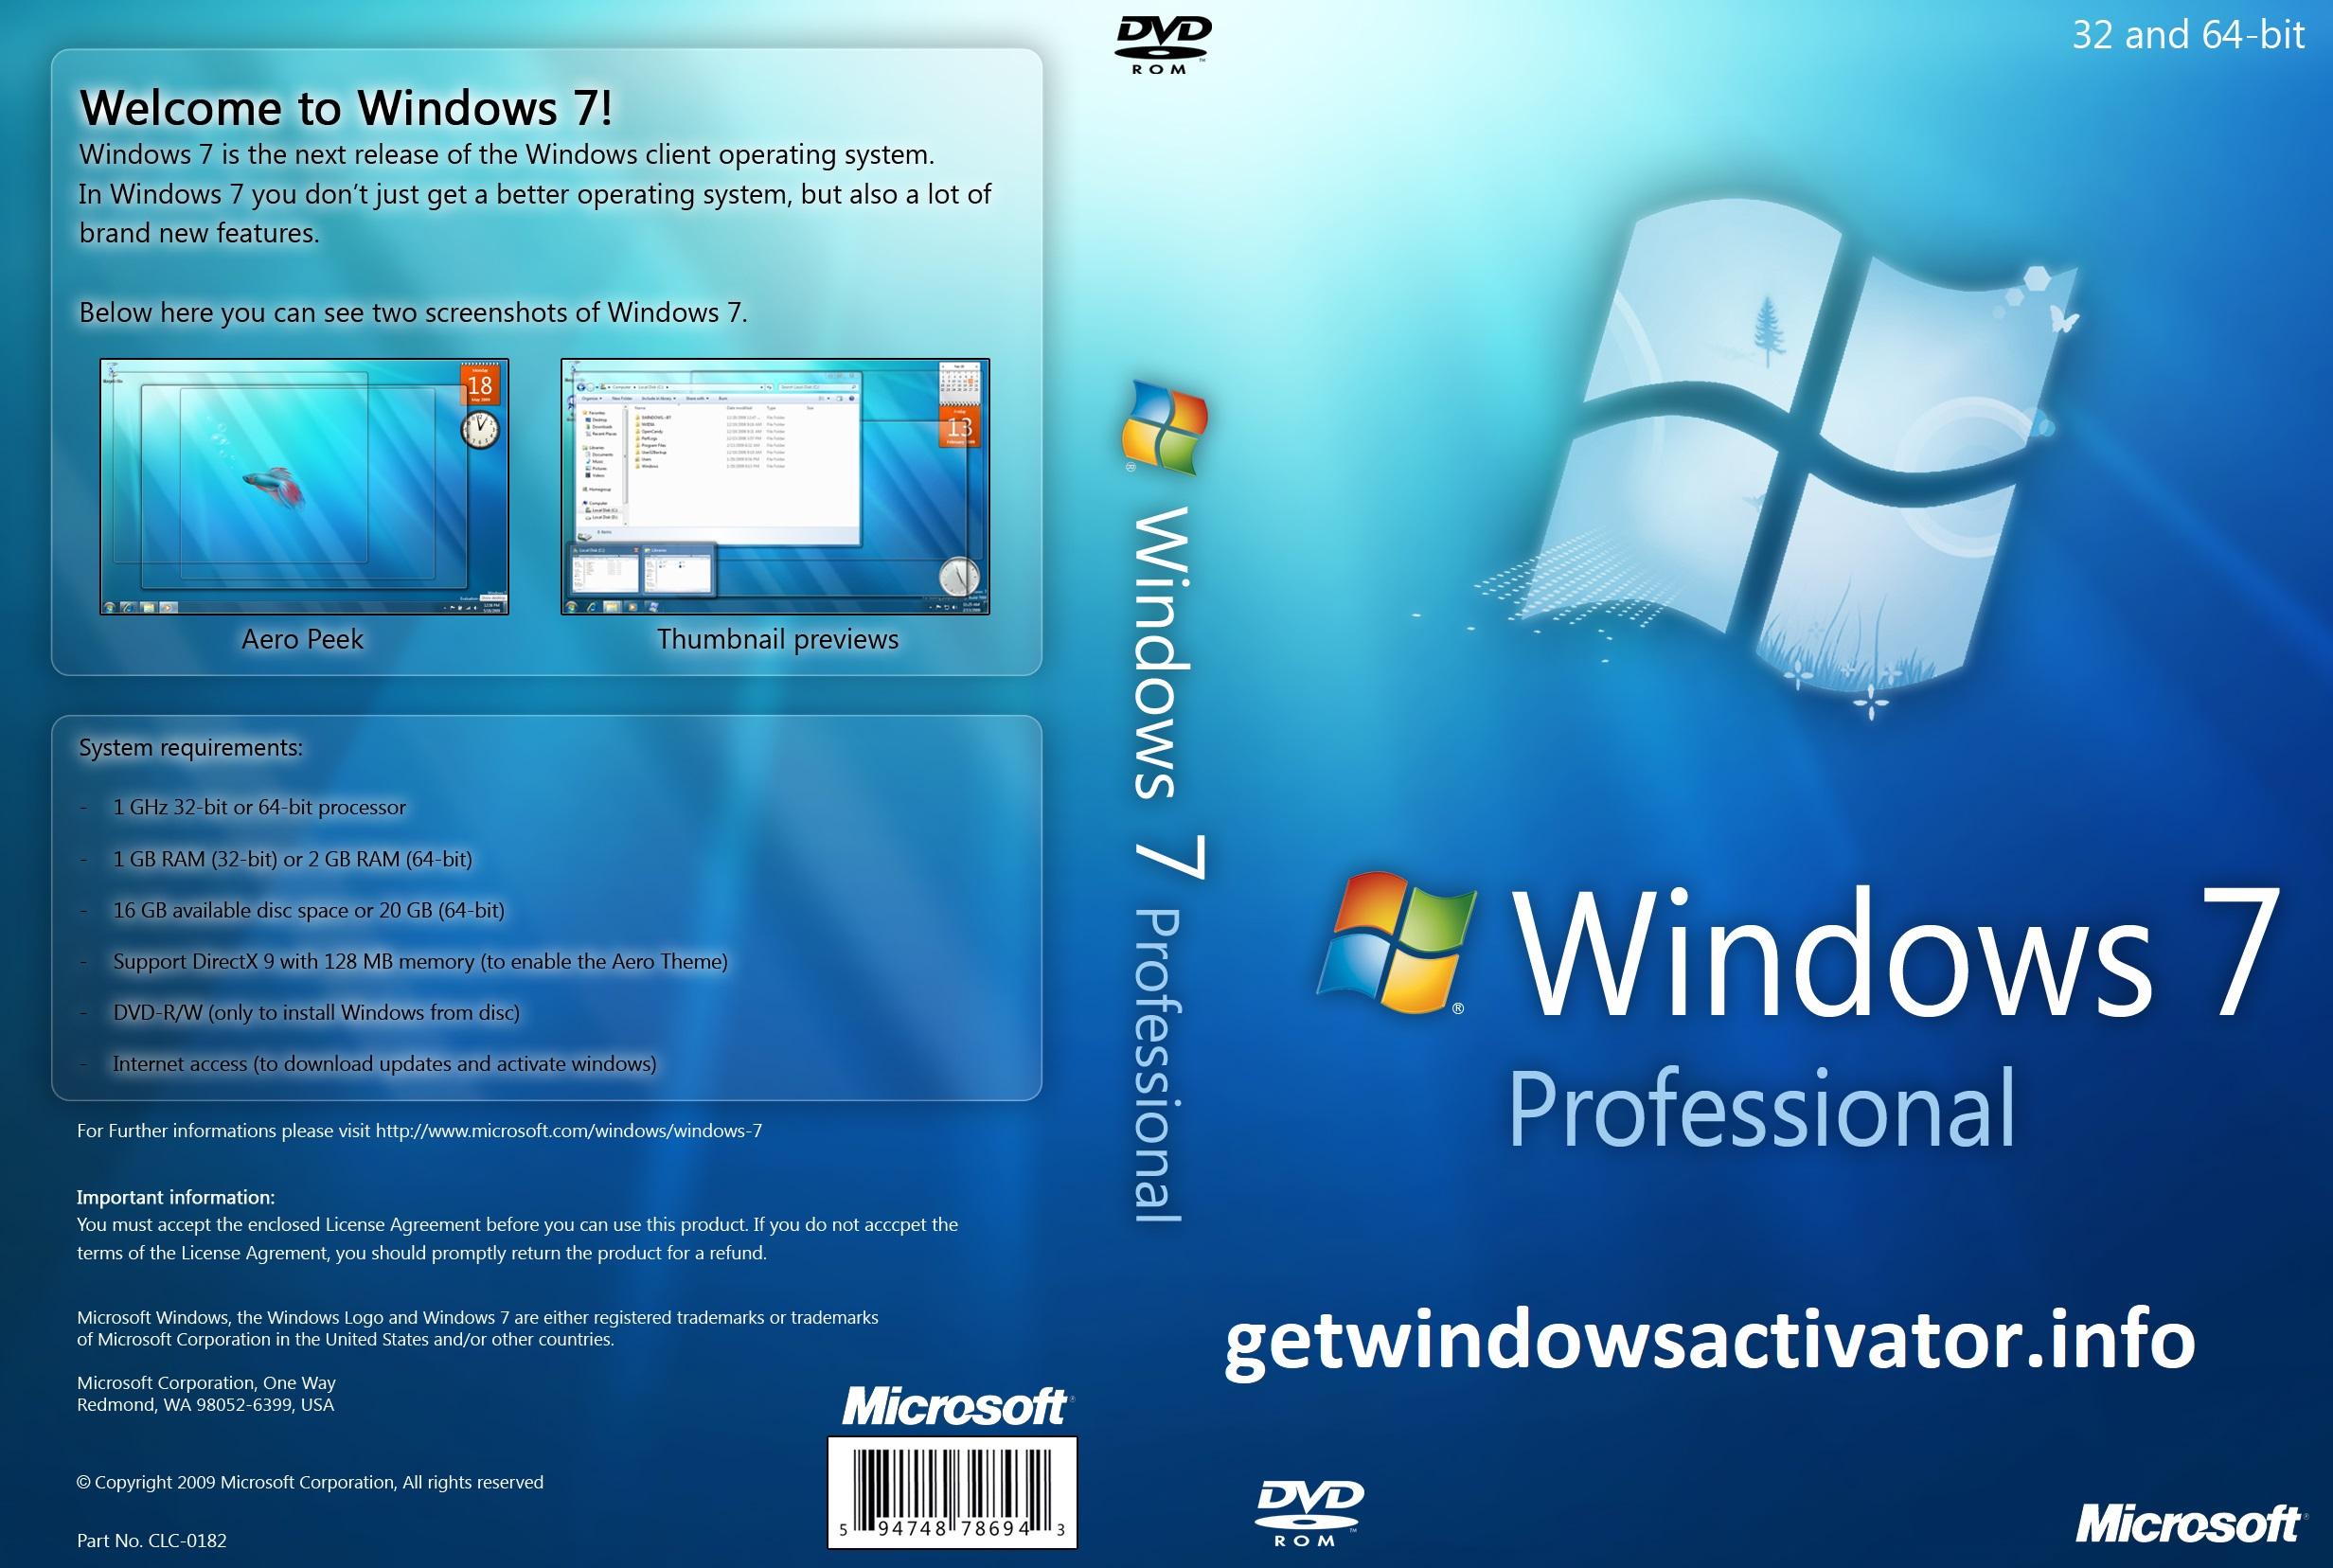 Windows 7 Professional Product Key Free Download 32 64 Bit